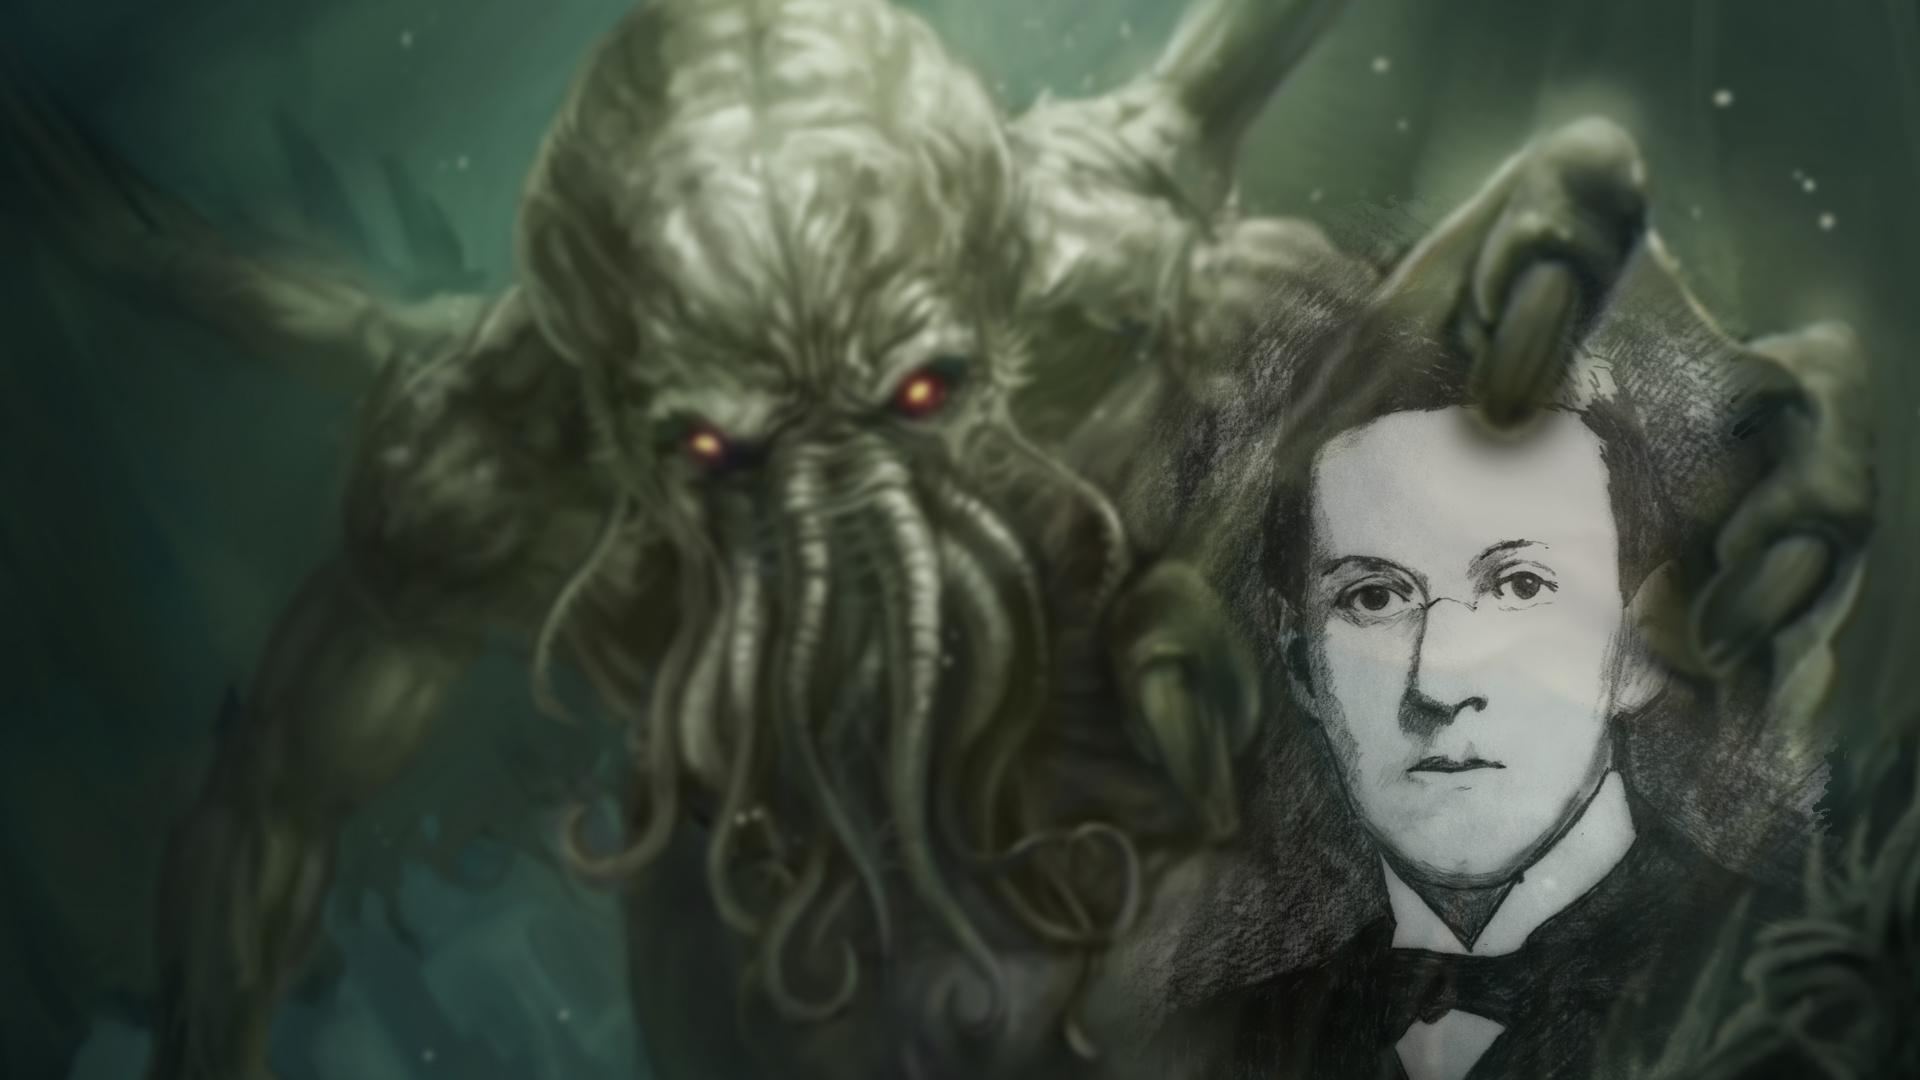 Tornano i miti di Cthulhu – Francesco La Manno